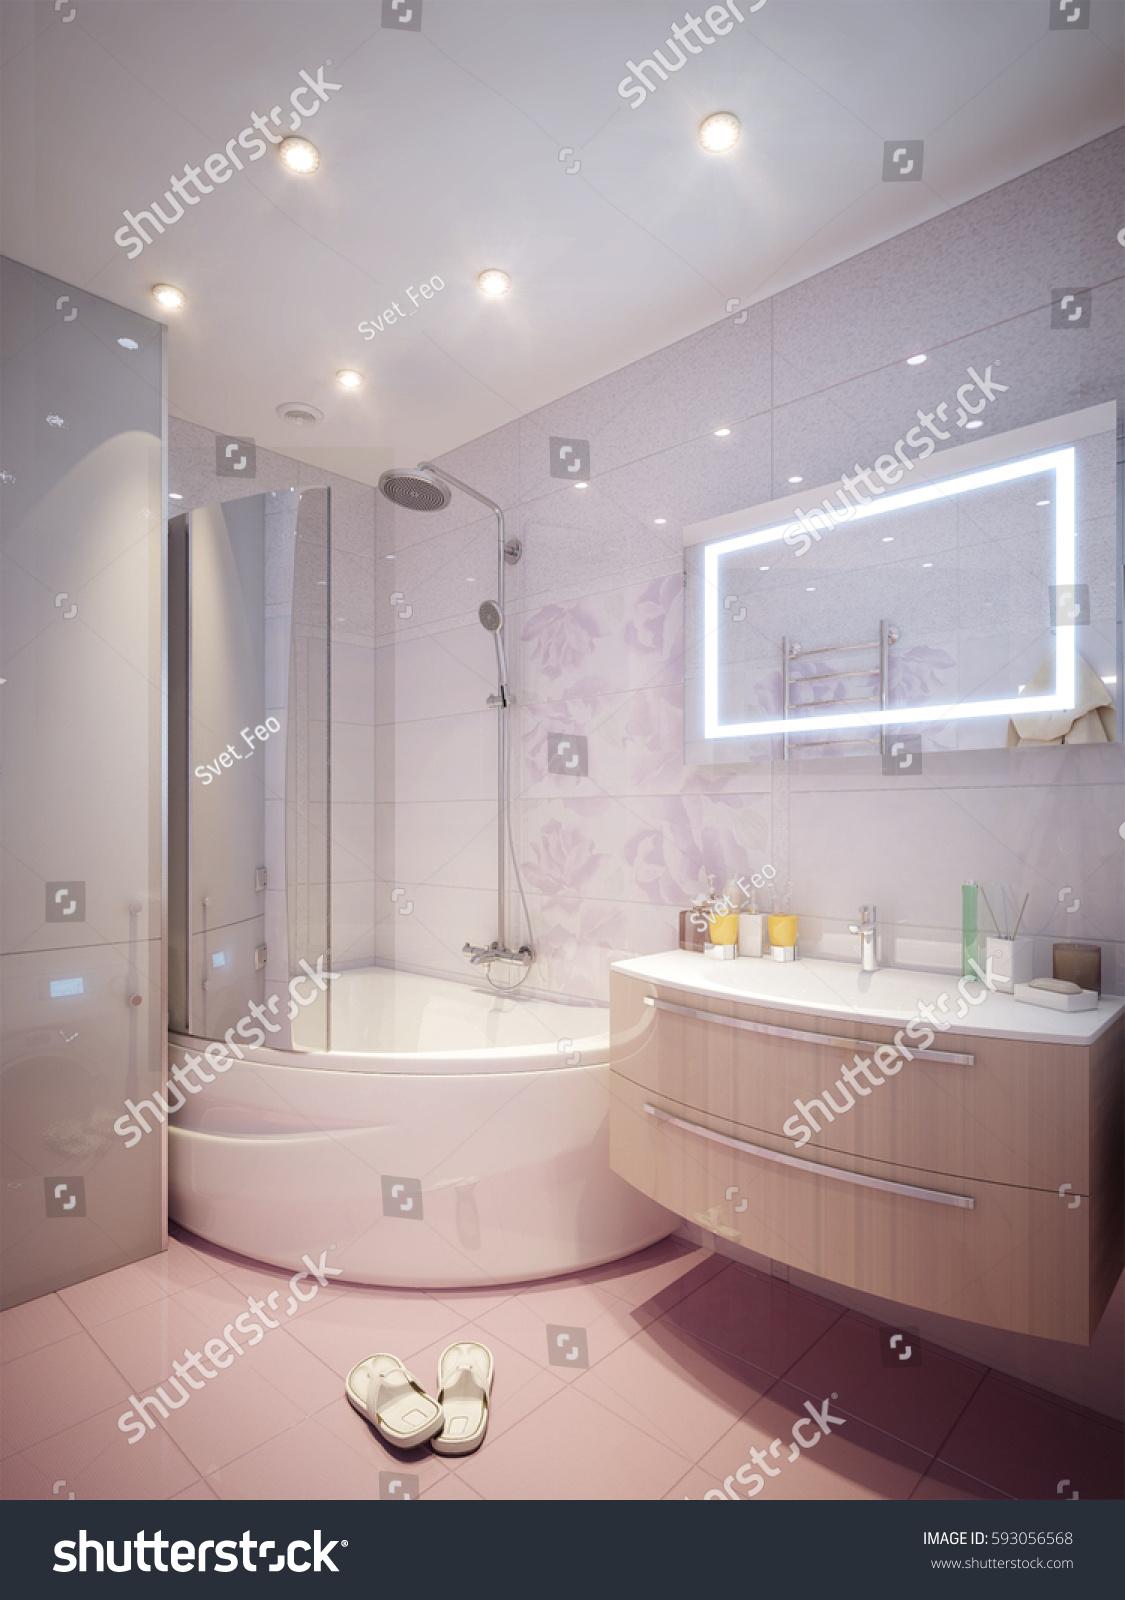 Royalty Free Stock Illustration of Modern Bathroom Interior Pink ...